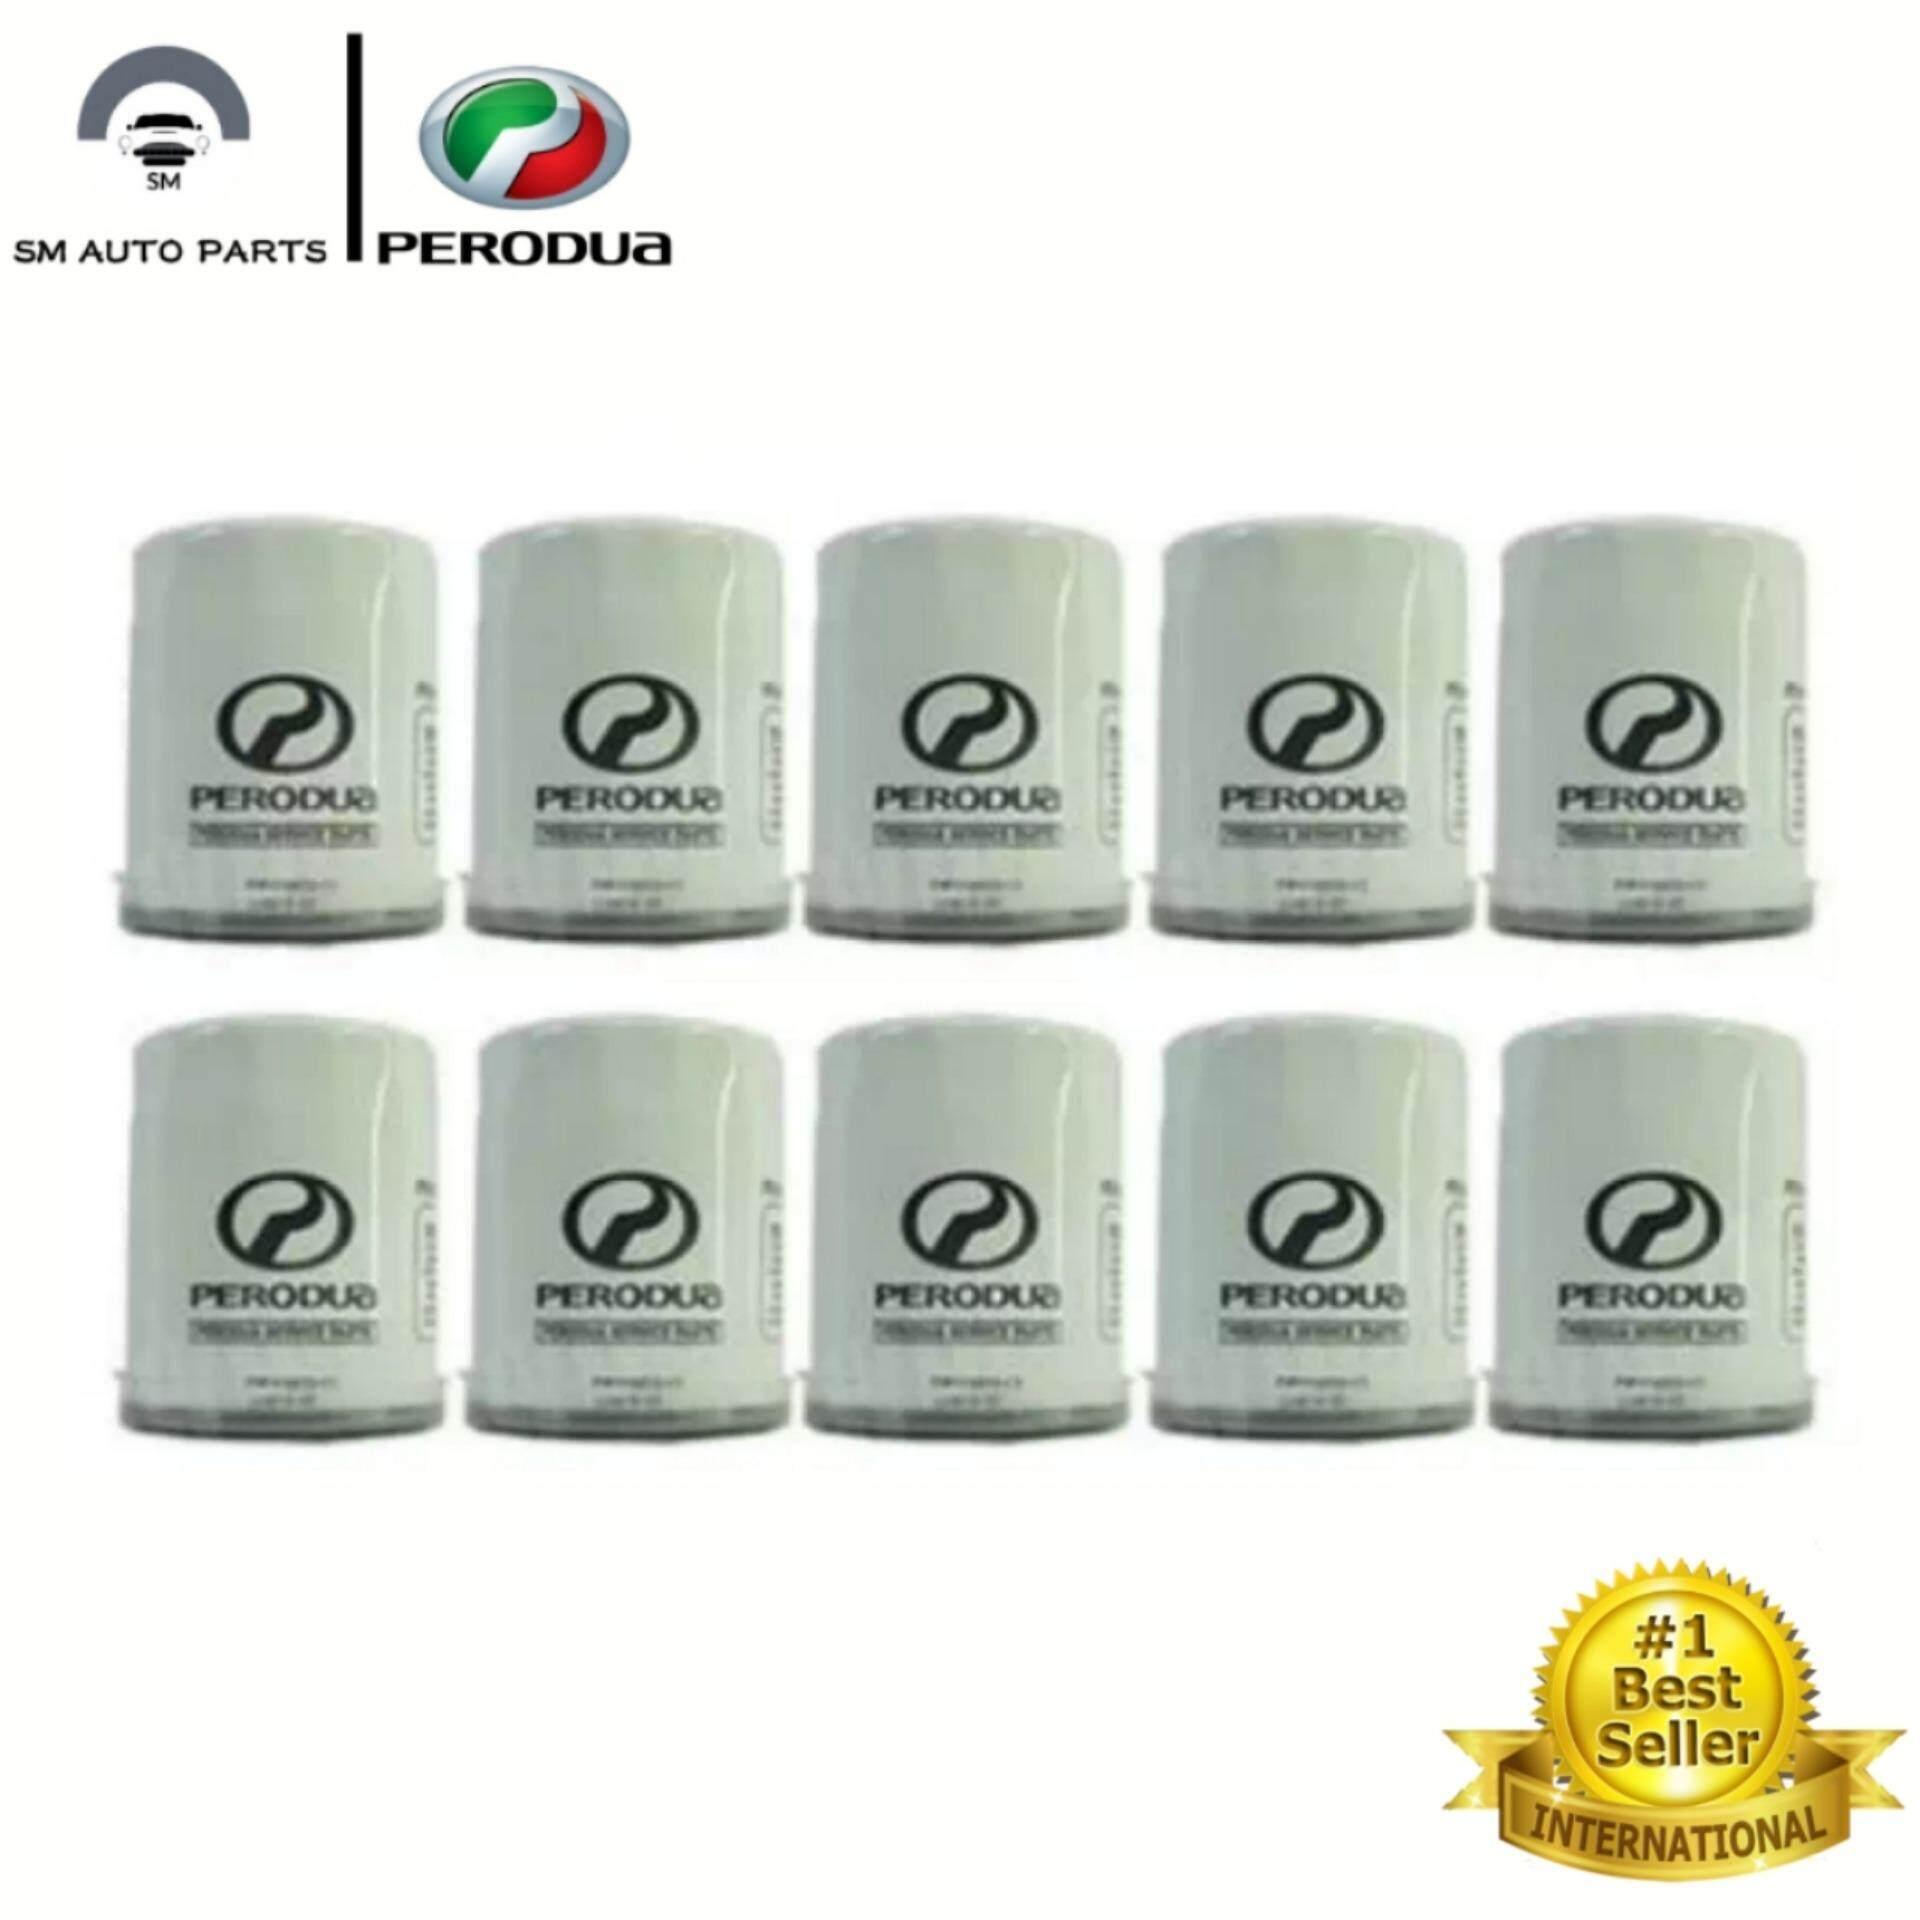 Perodua Products For The Best Prices In Malaysia Wiring Diagram Kancil 850 Oil Filter Myvi Alza Viva Kelisa Kenari